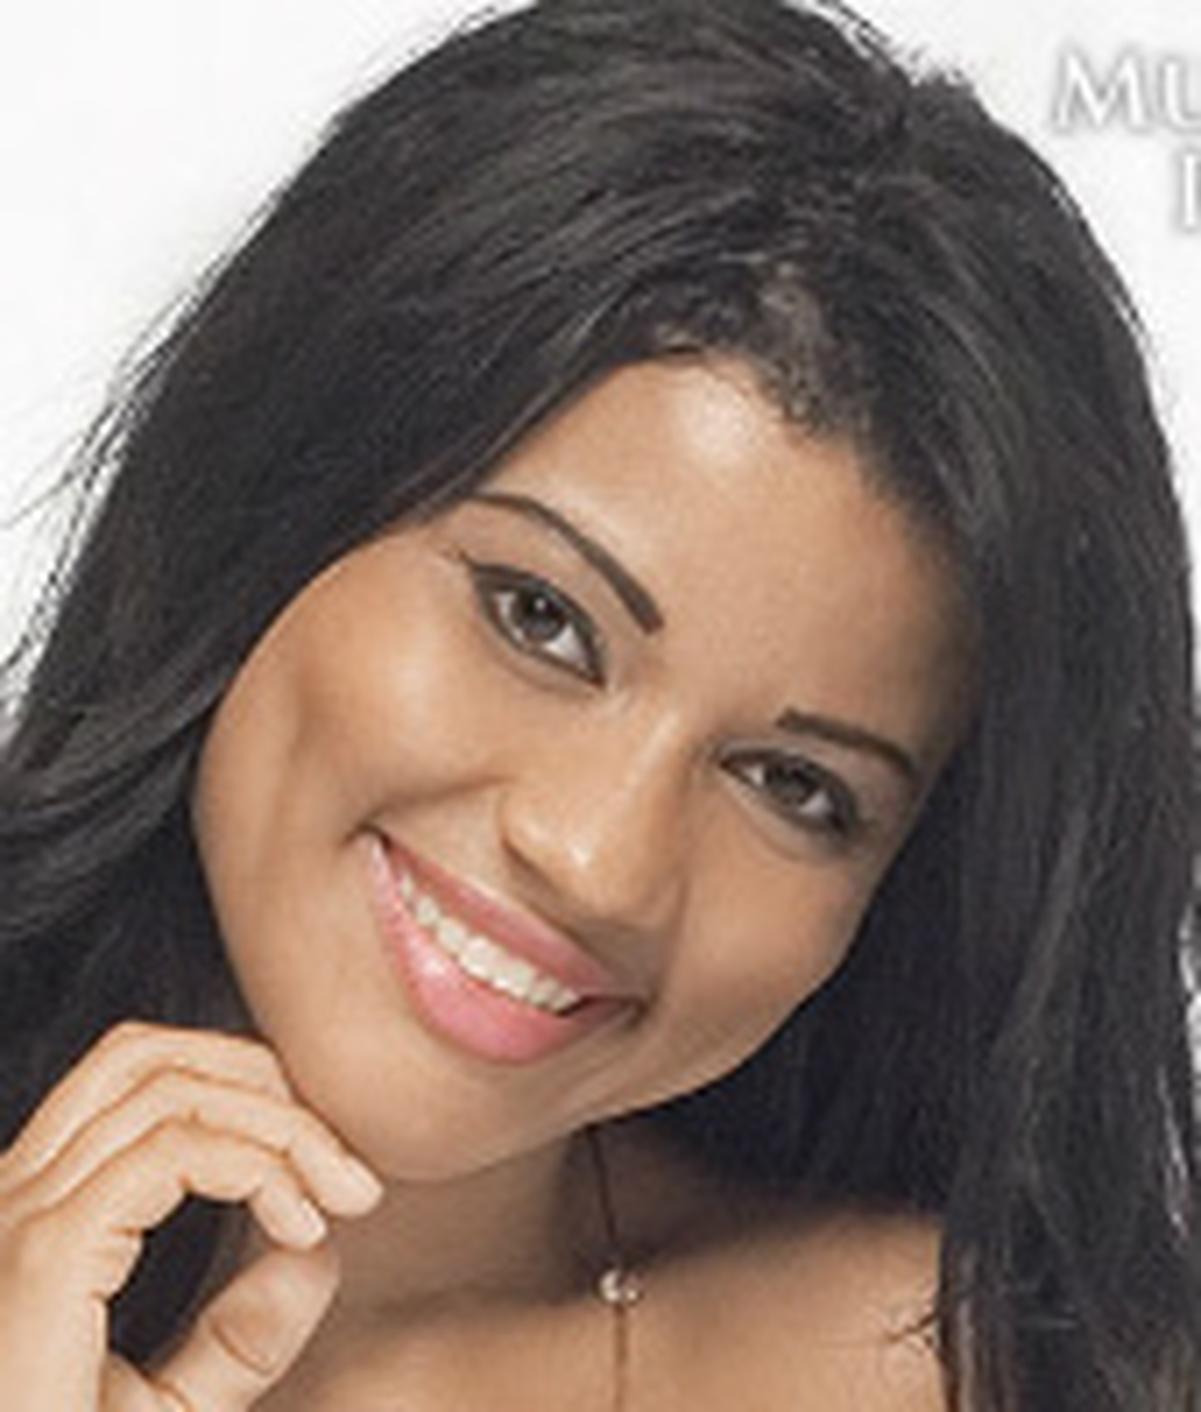 Janaina Paes